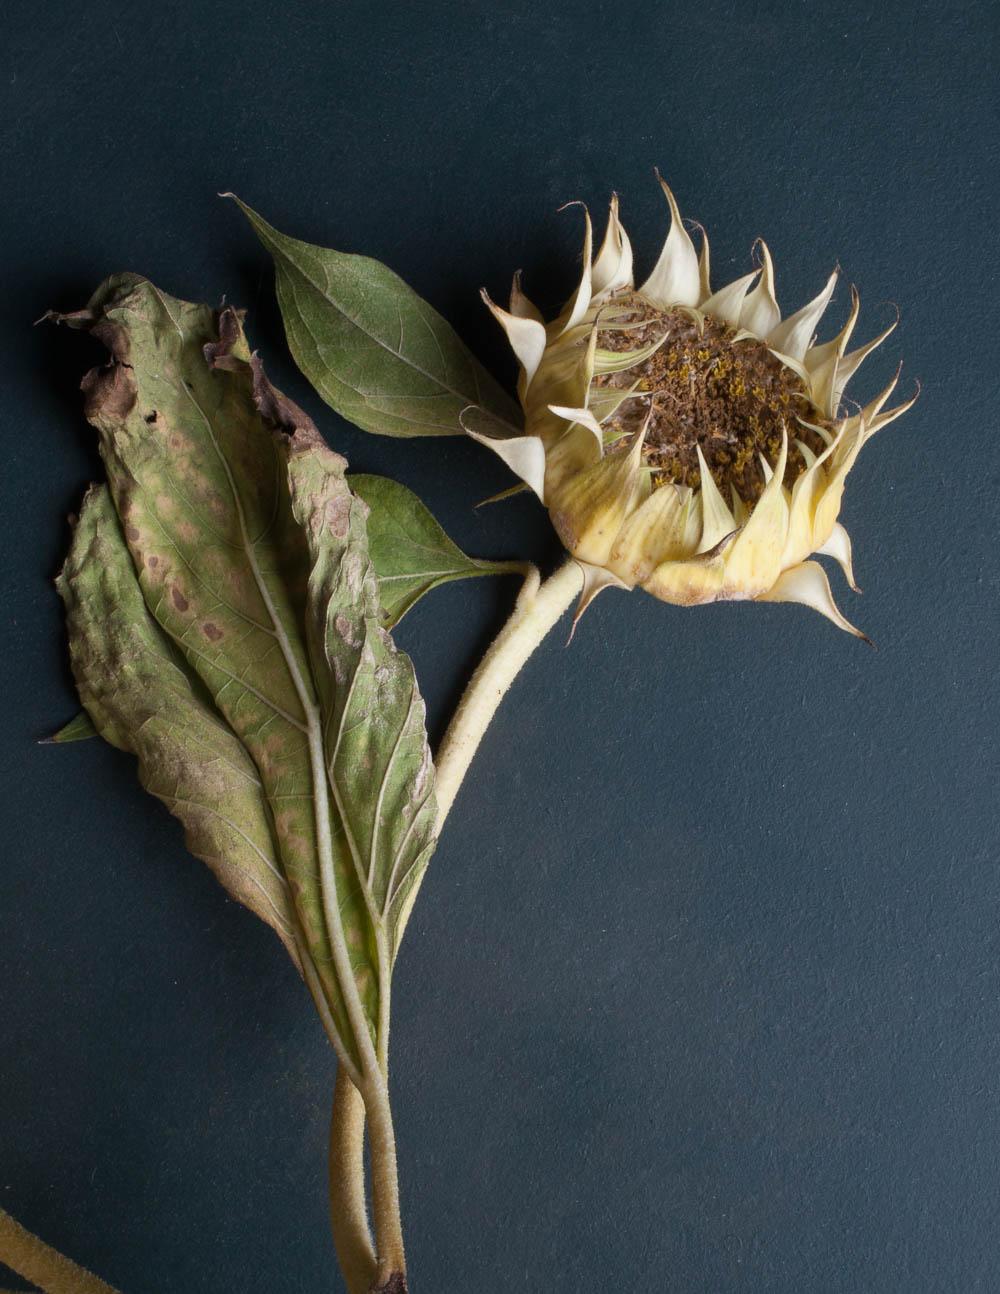 emmatsrobinson-fading-sunflower20180920-_MG_4101.jpg